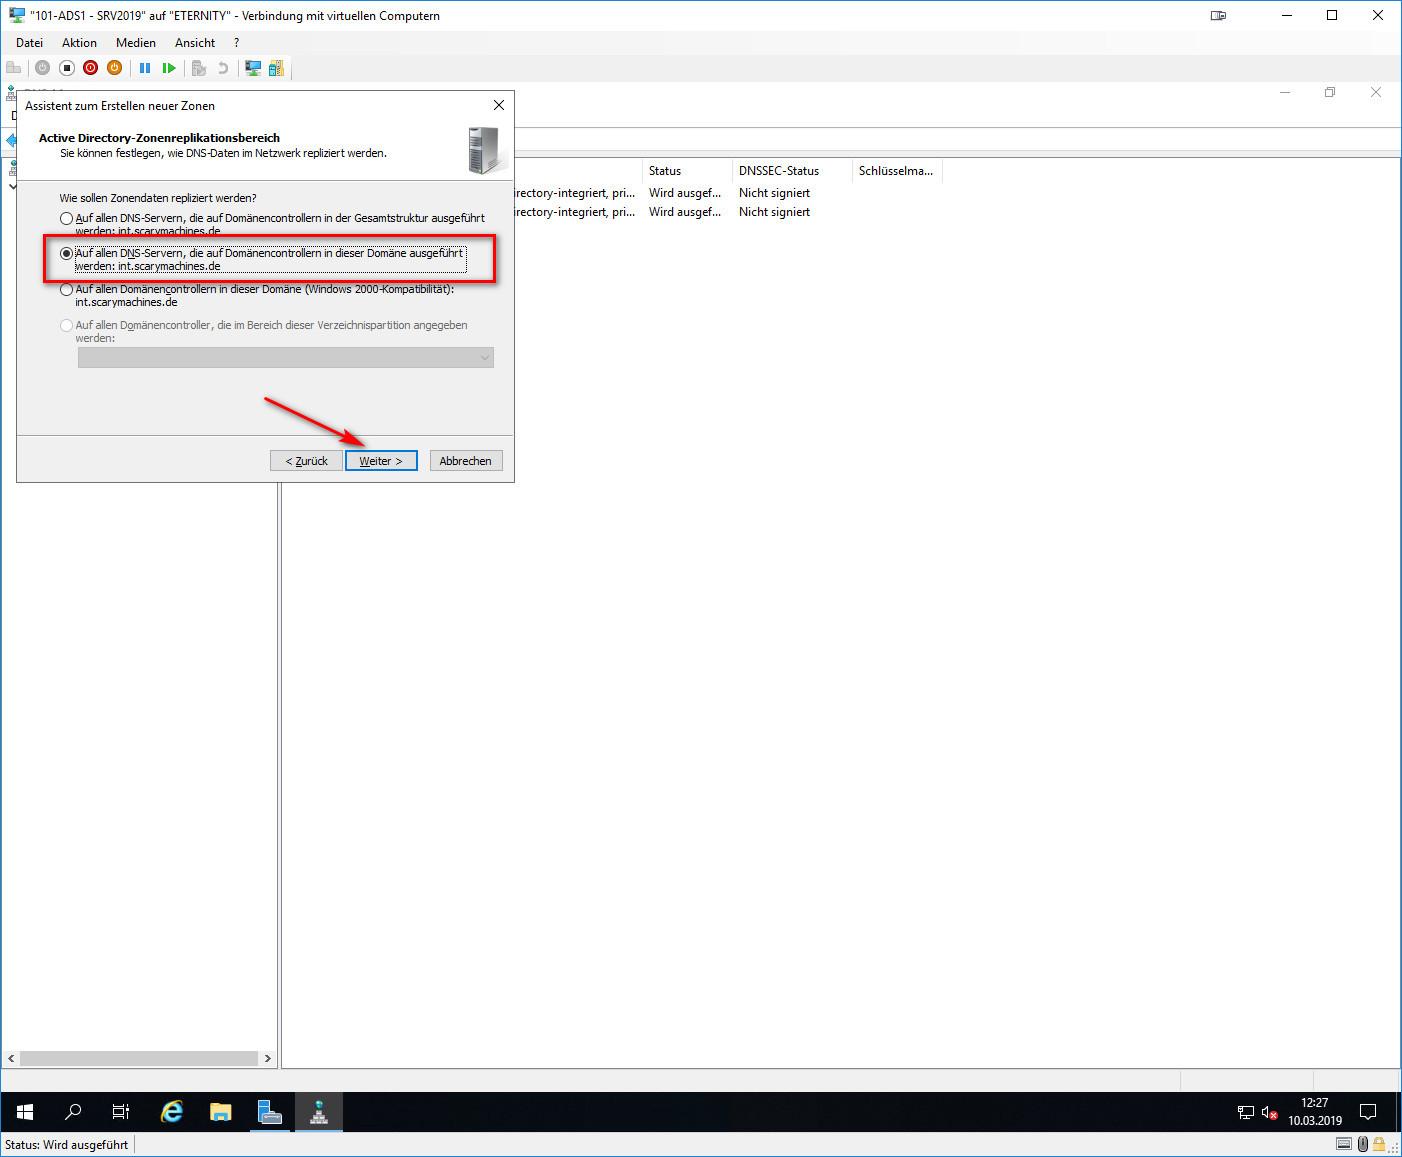 Active Directory-Zonenreplikationsbereich